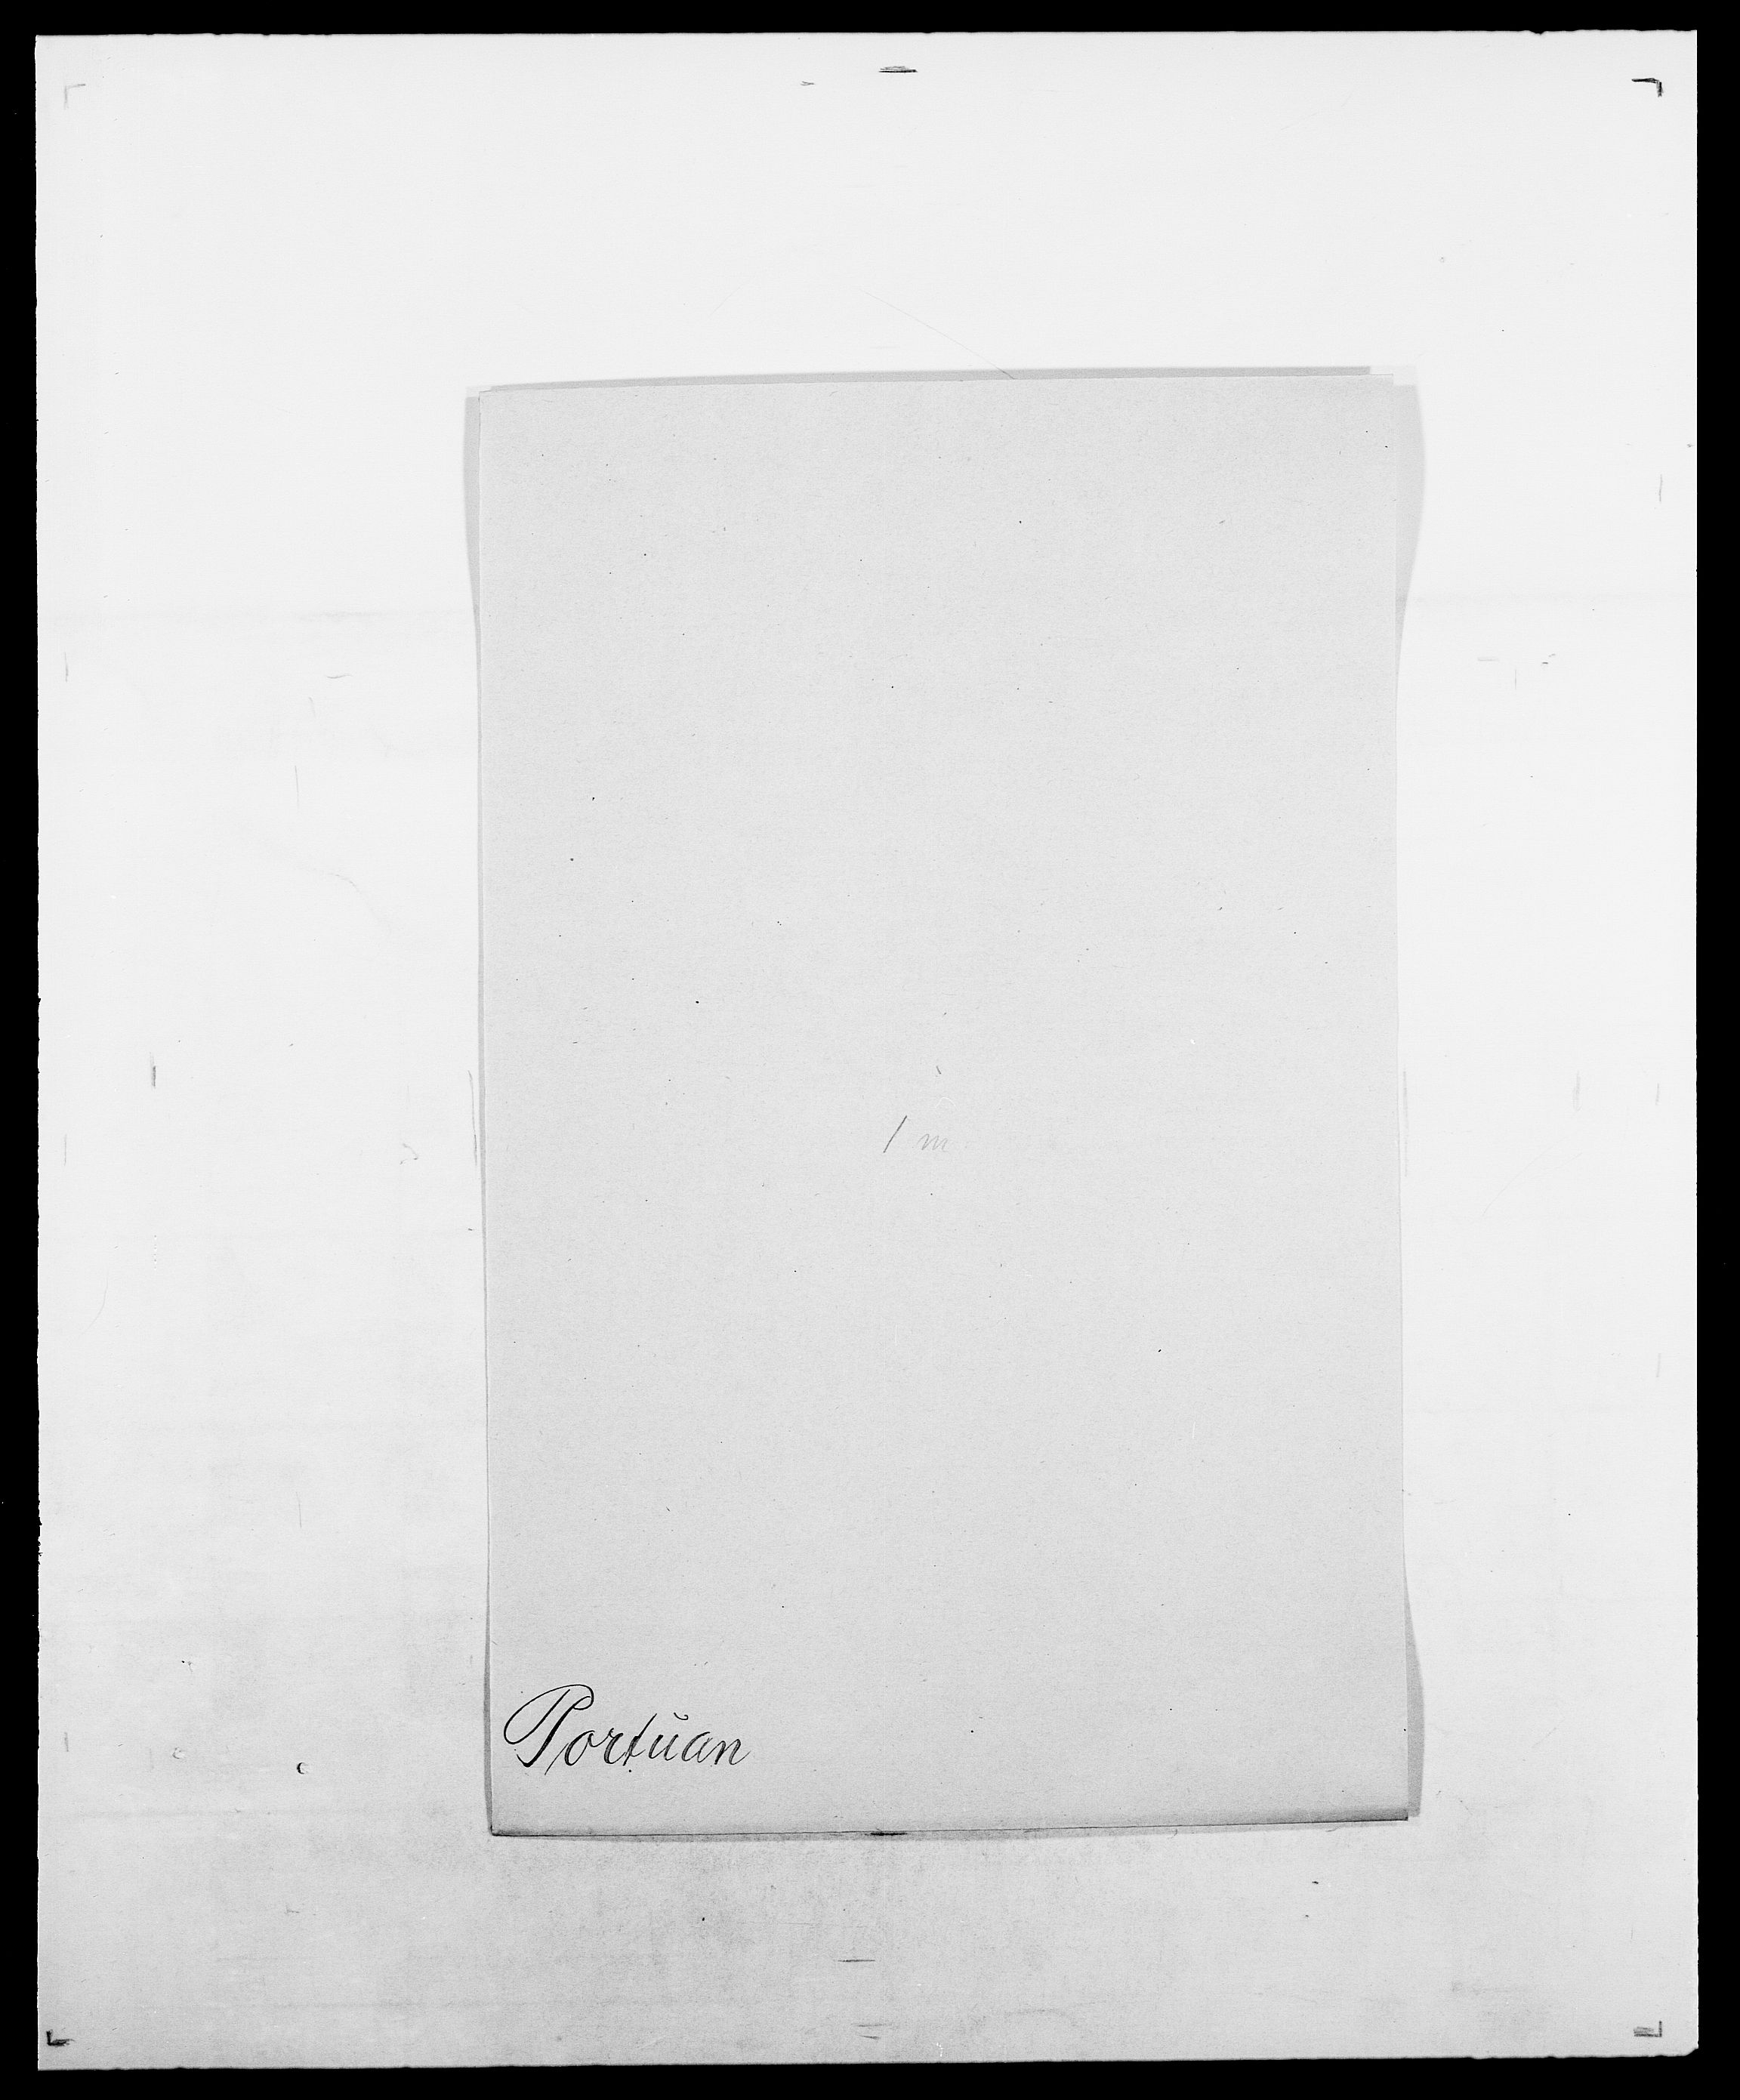 SAO, Delgobe, Charles Antoine - samling, D/Da/L0031: de Place - Raaum, s. 250